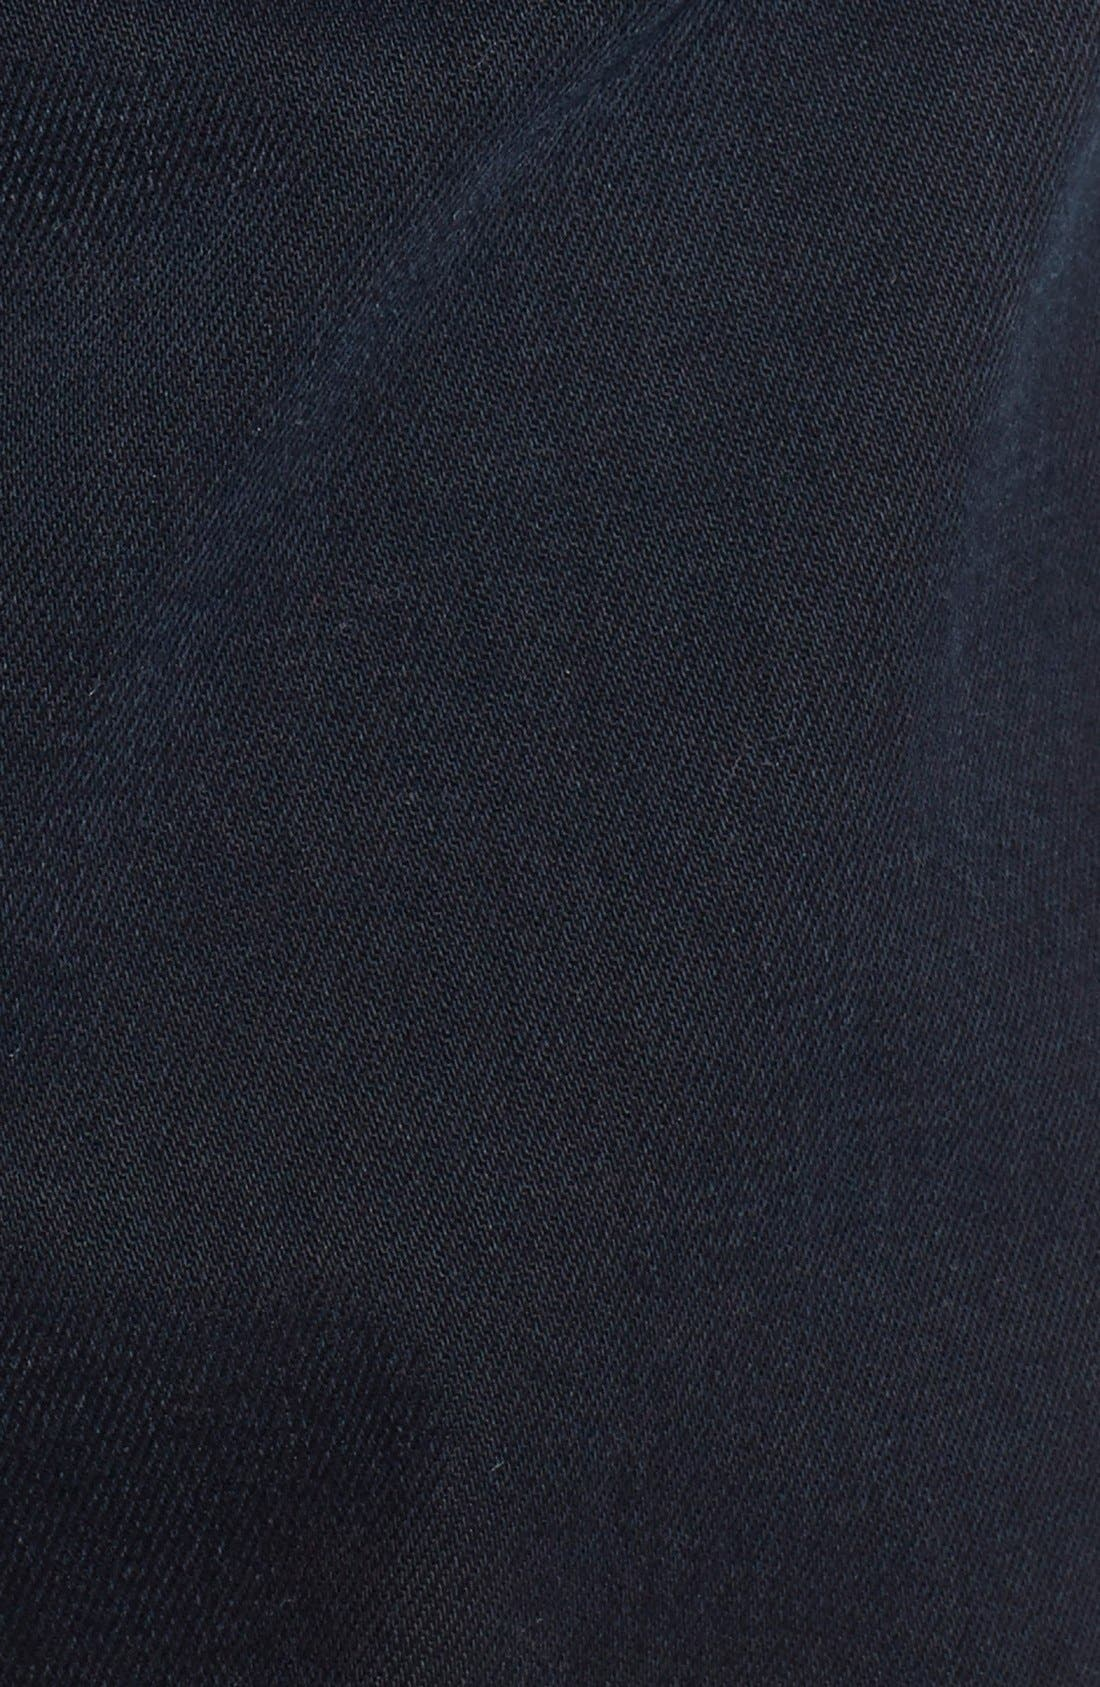 Alternate Image 4  - Hudson Jeans 'Sartor' Slouchy Skinny Fit Jeans (Sanction)